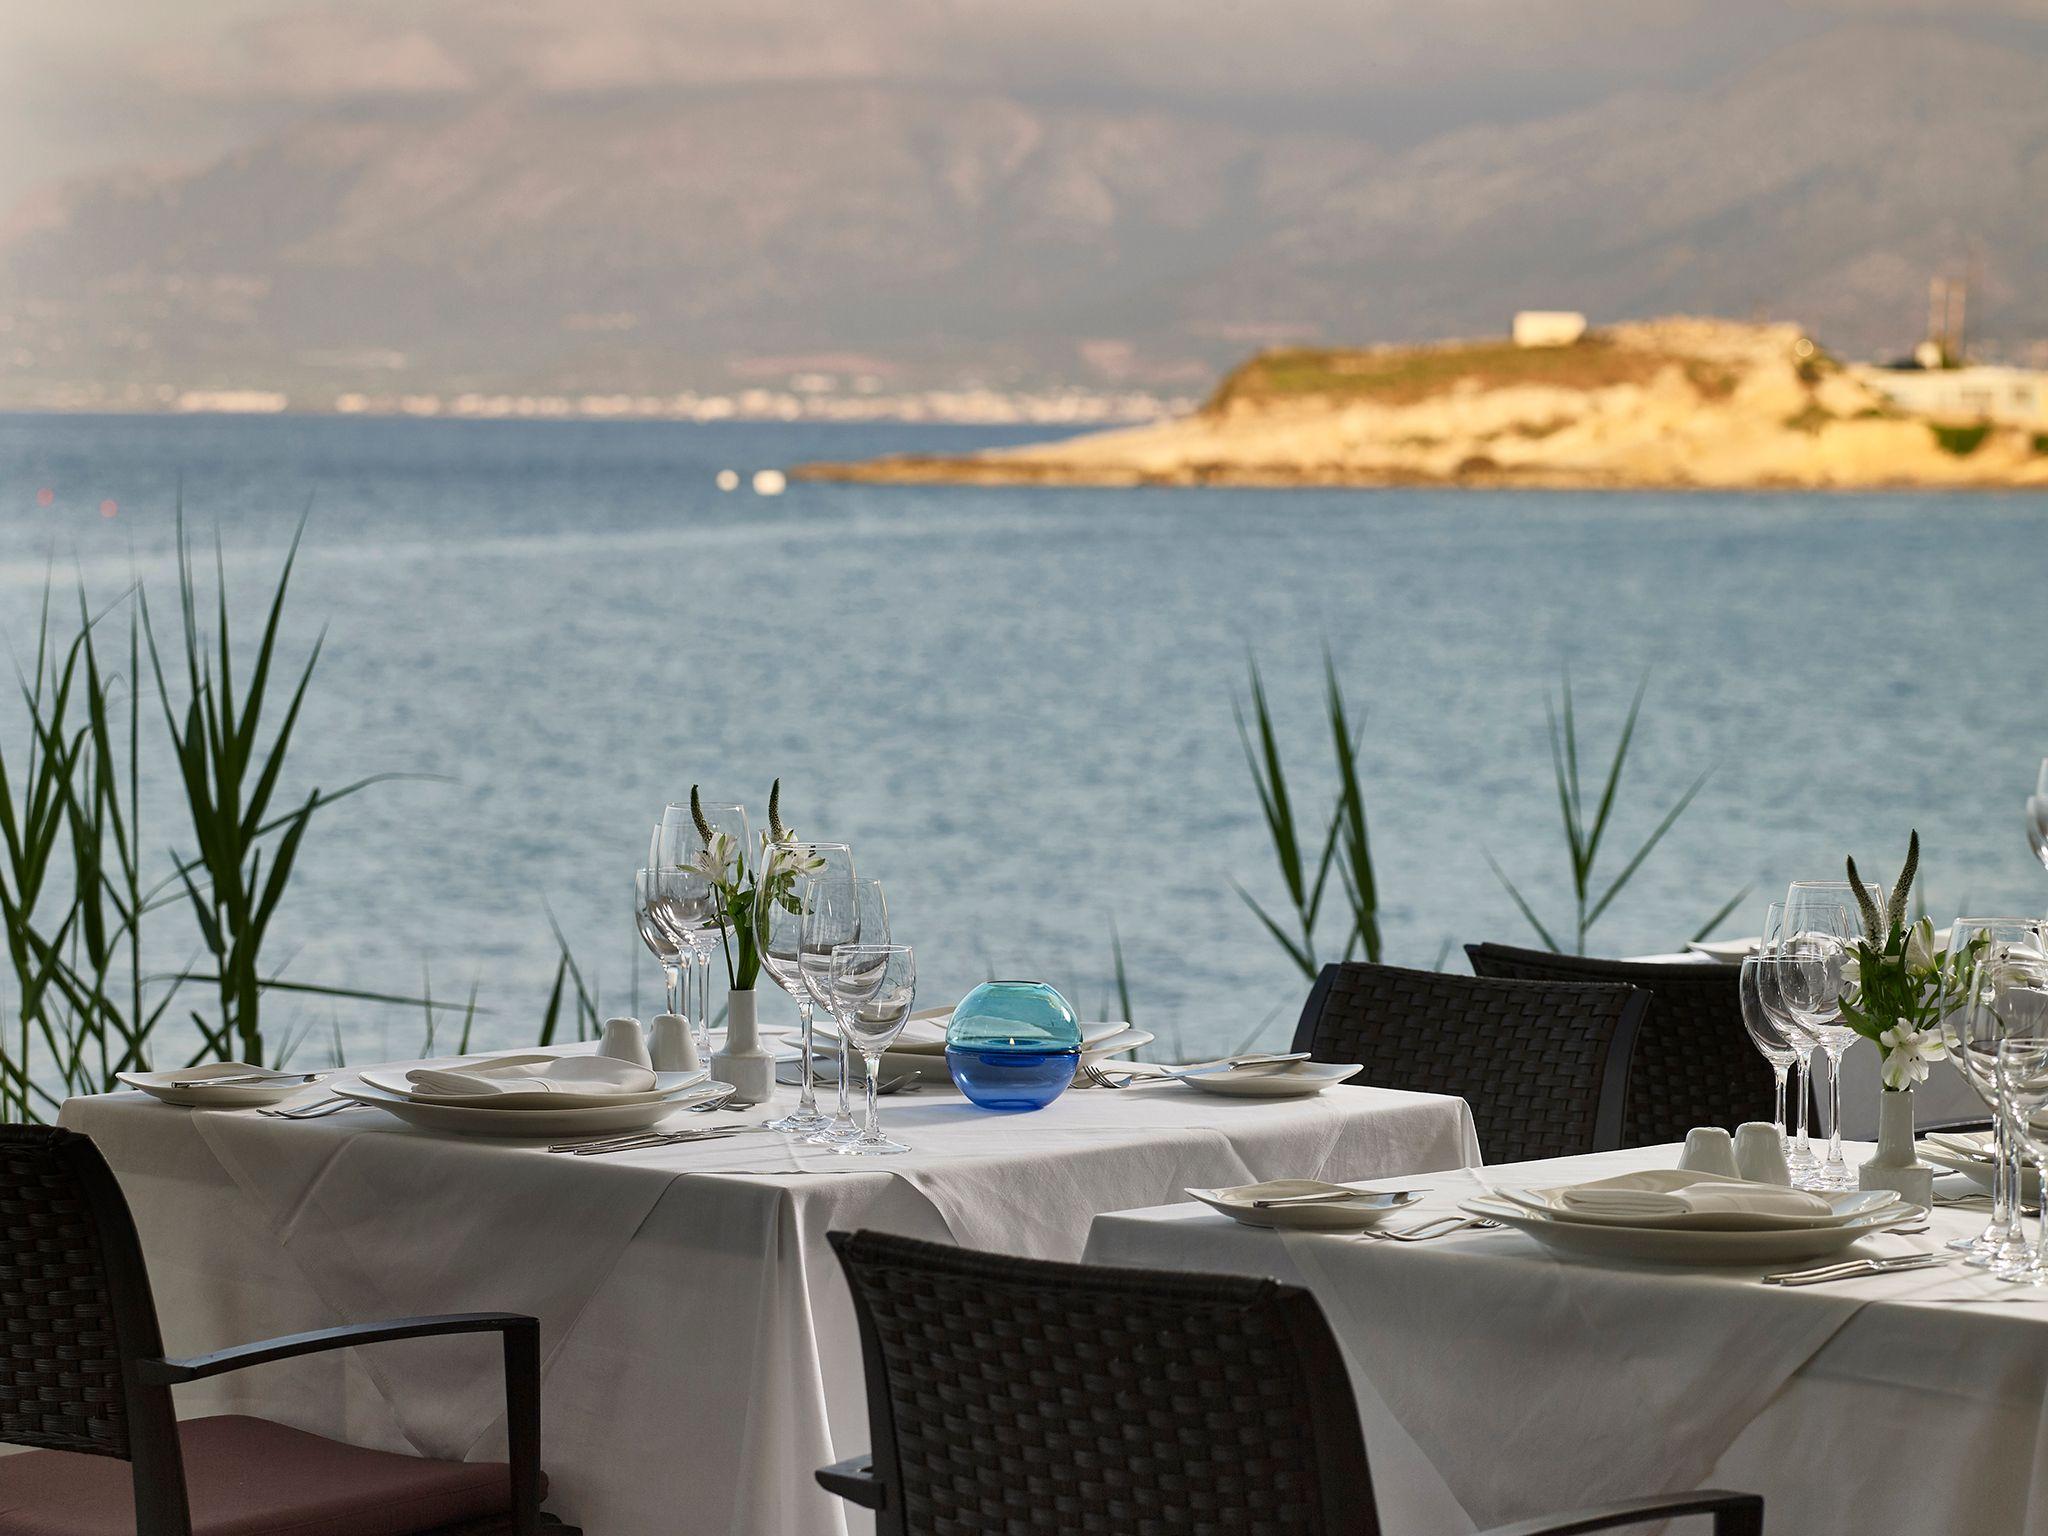 restauracja Cochlias, hotel Creta Maris, Kreta